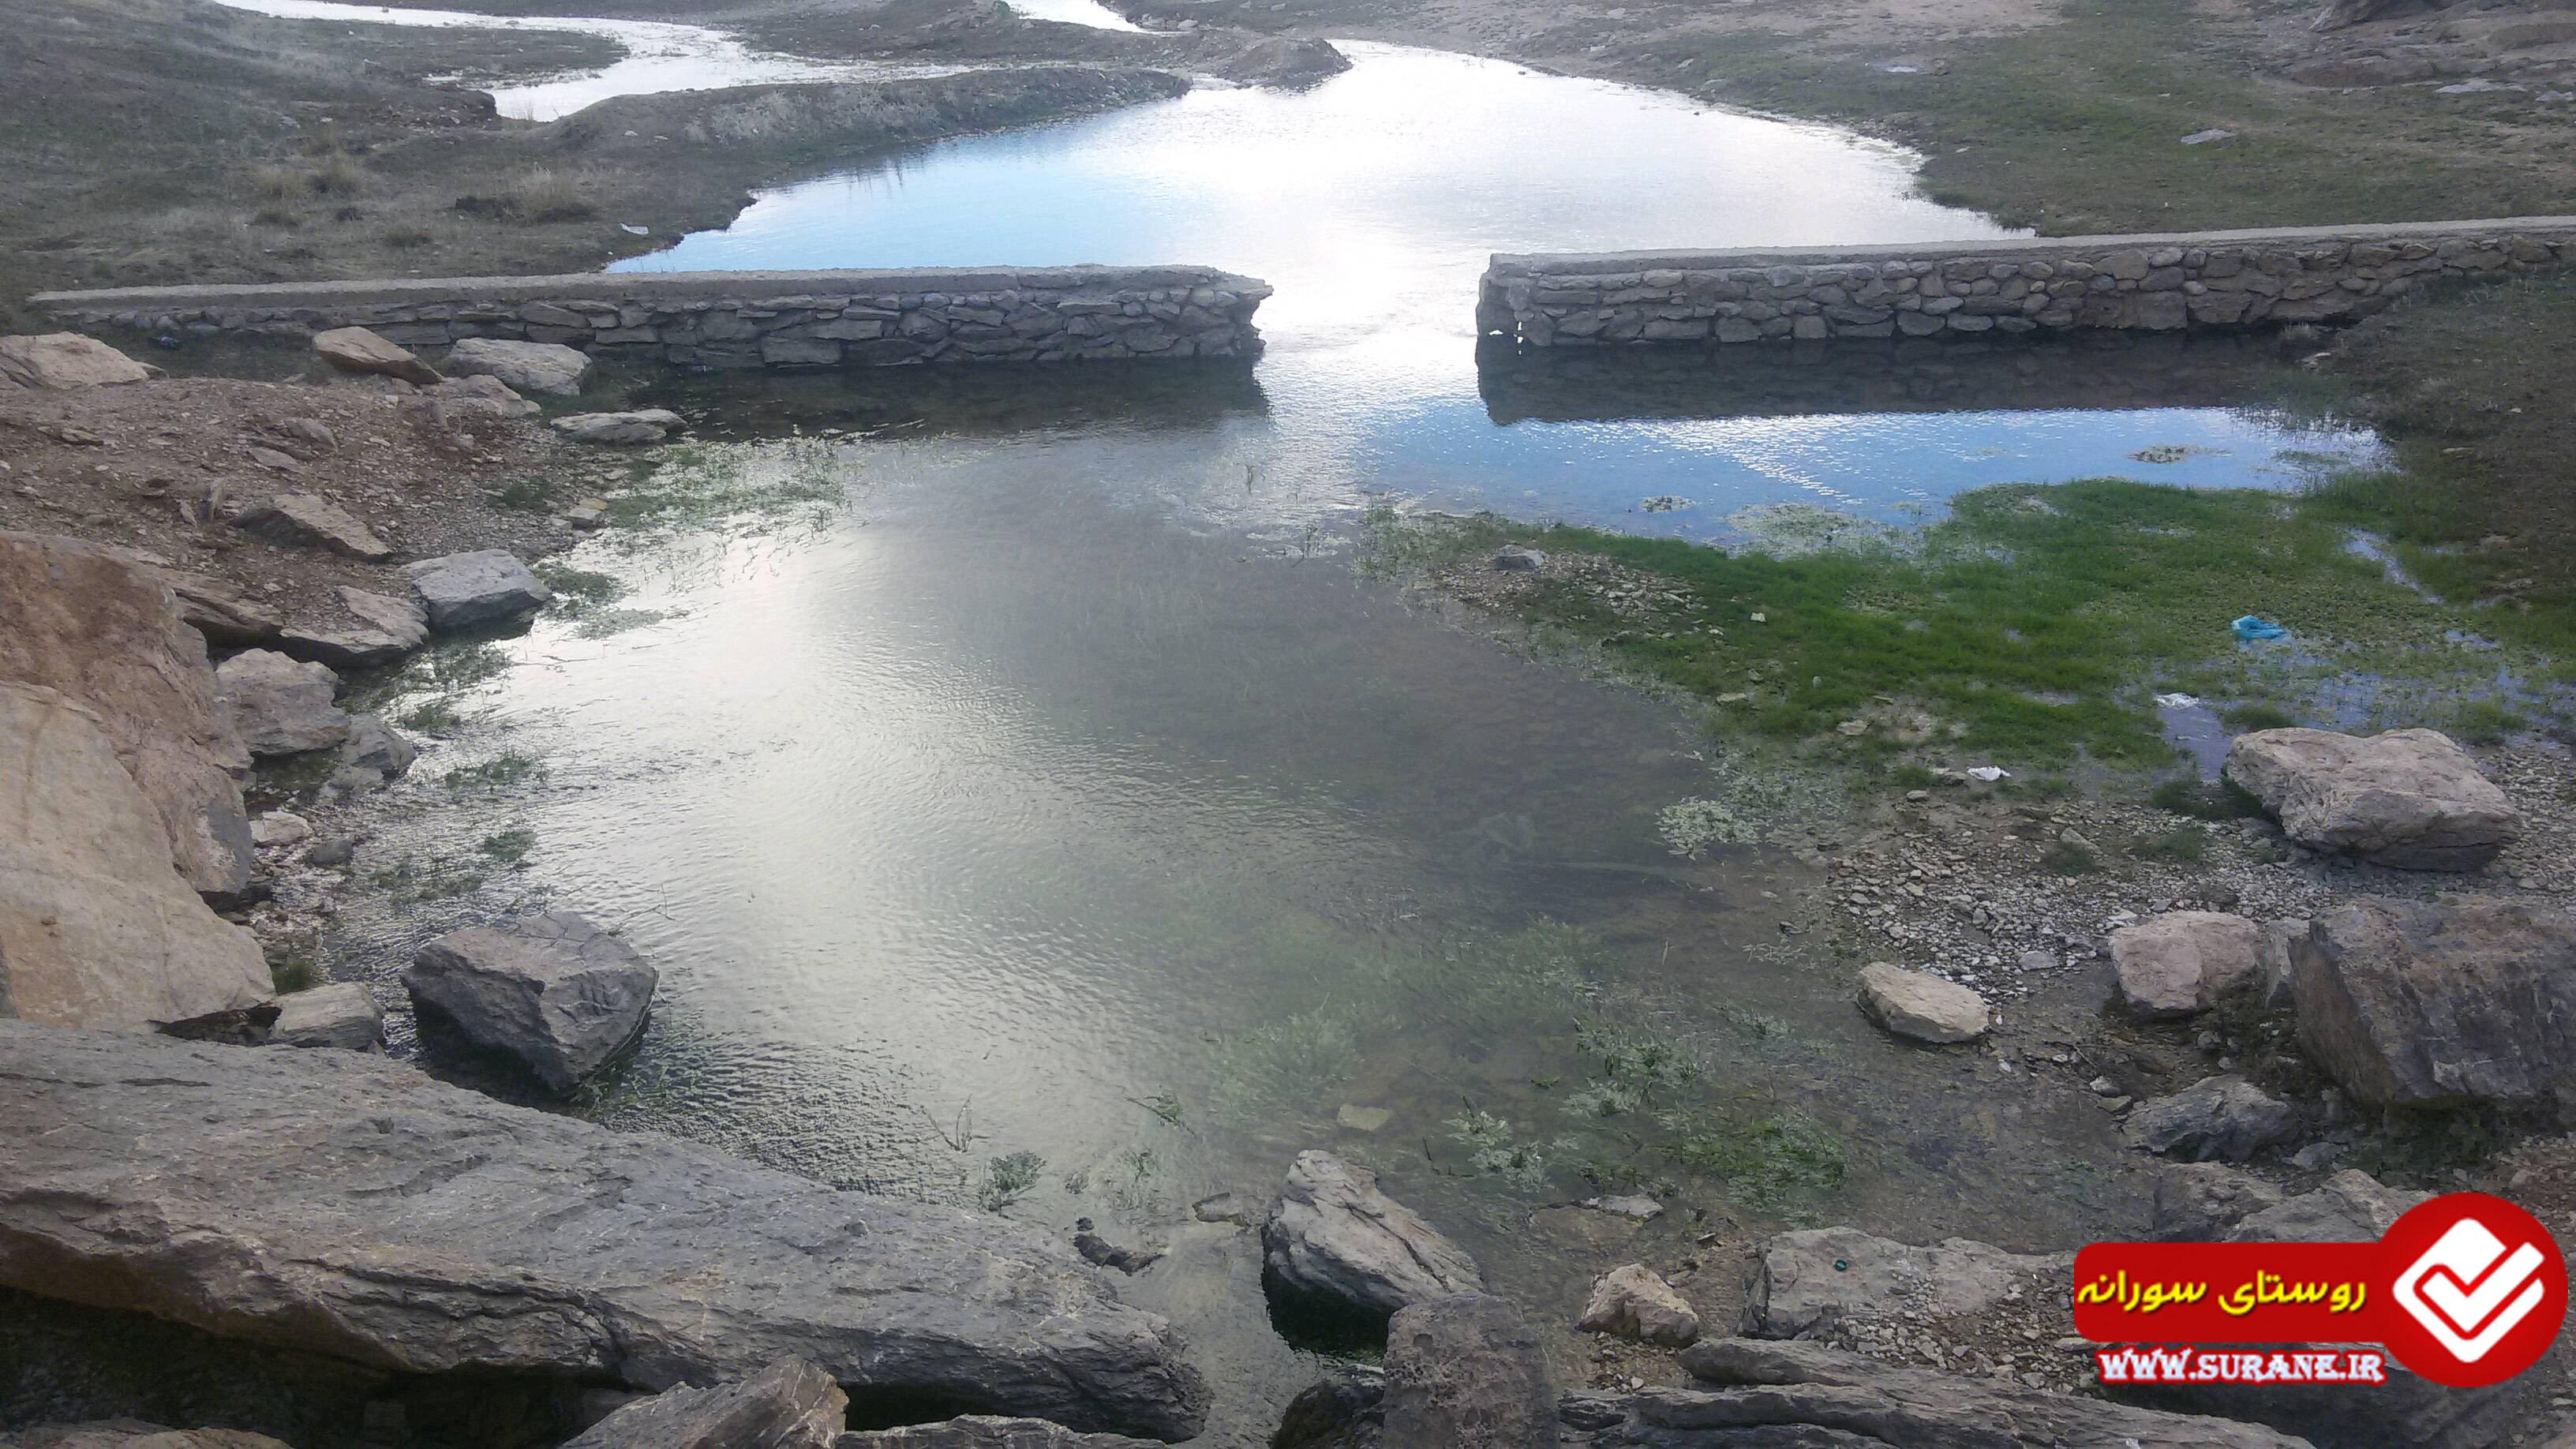 سراب روستای سورانه